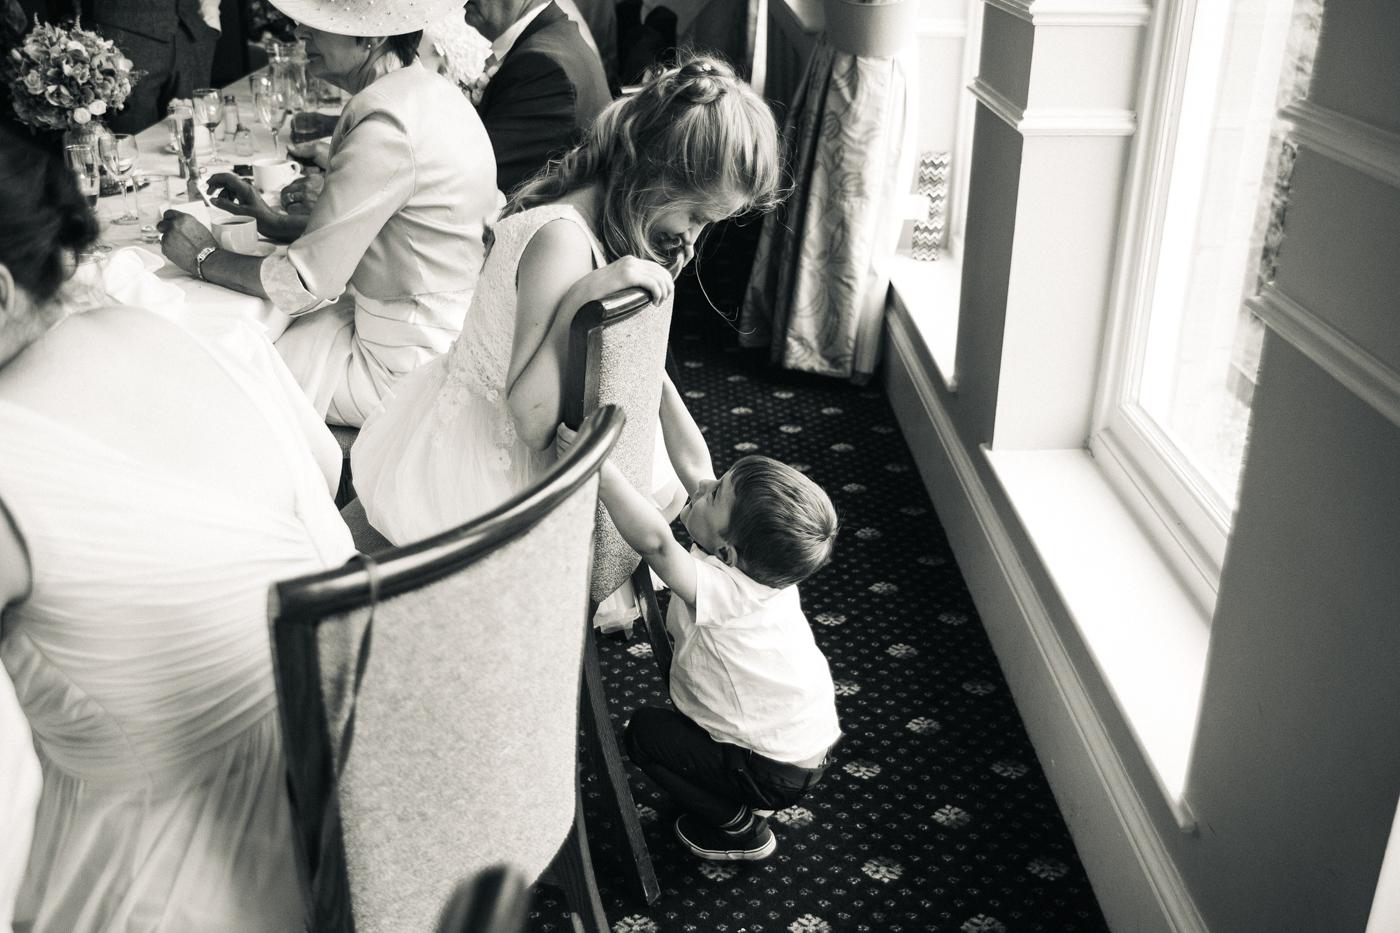 teesside-middlesbrough-north-east-wedding-photographer-creative-wedding-venues-0009.jpg